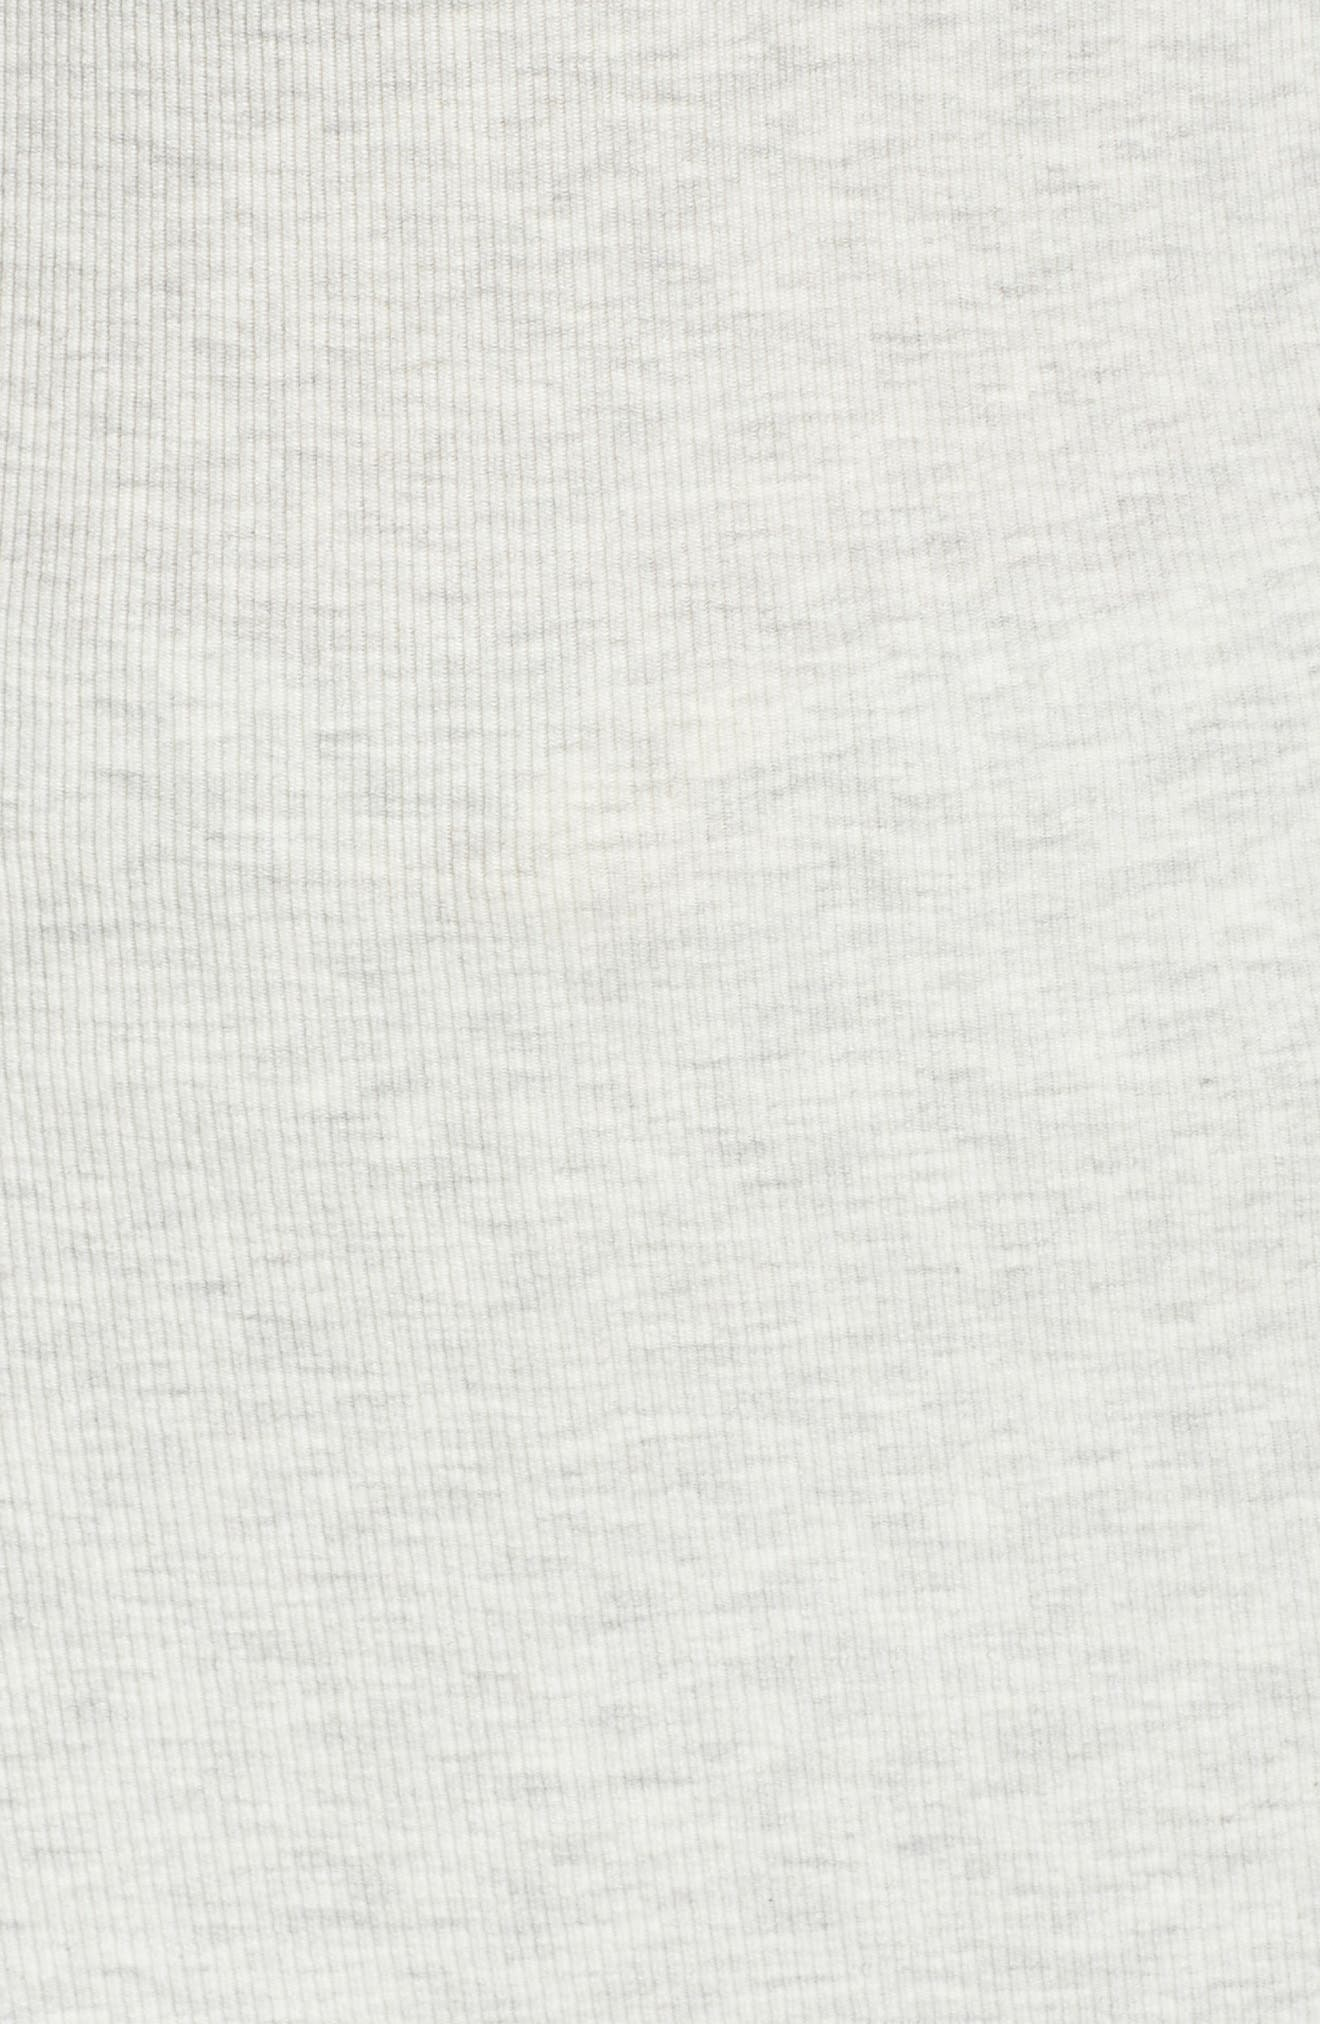 Daydream Long Sleeve Henley,                             Alternate thumbnail 5, color,                             GREY HEATHER